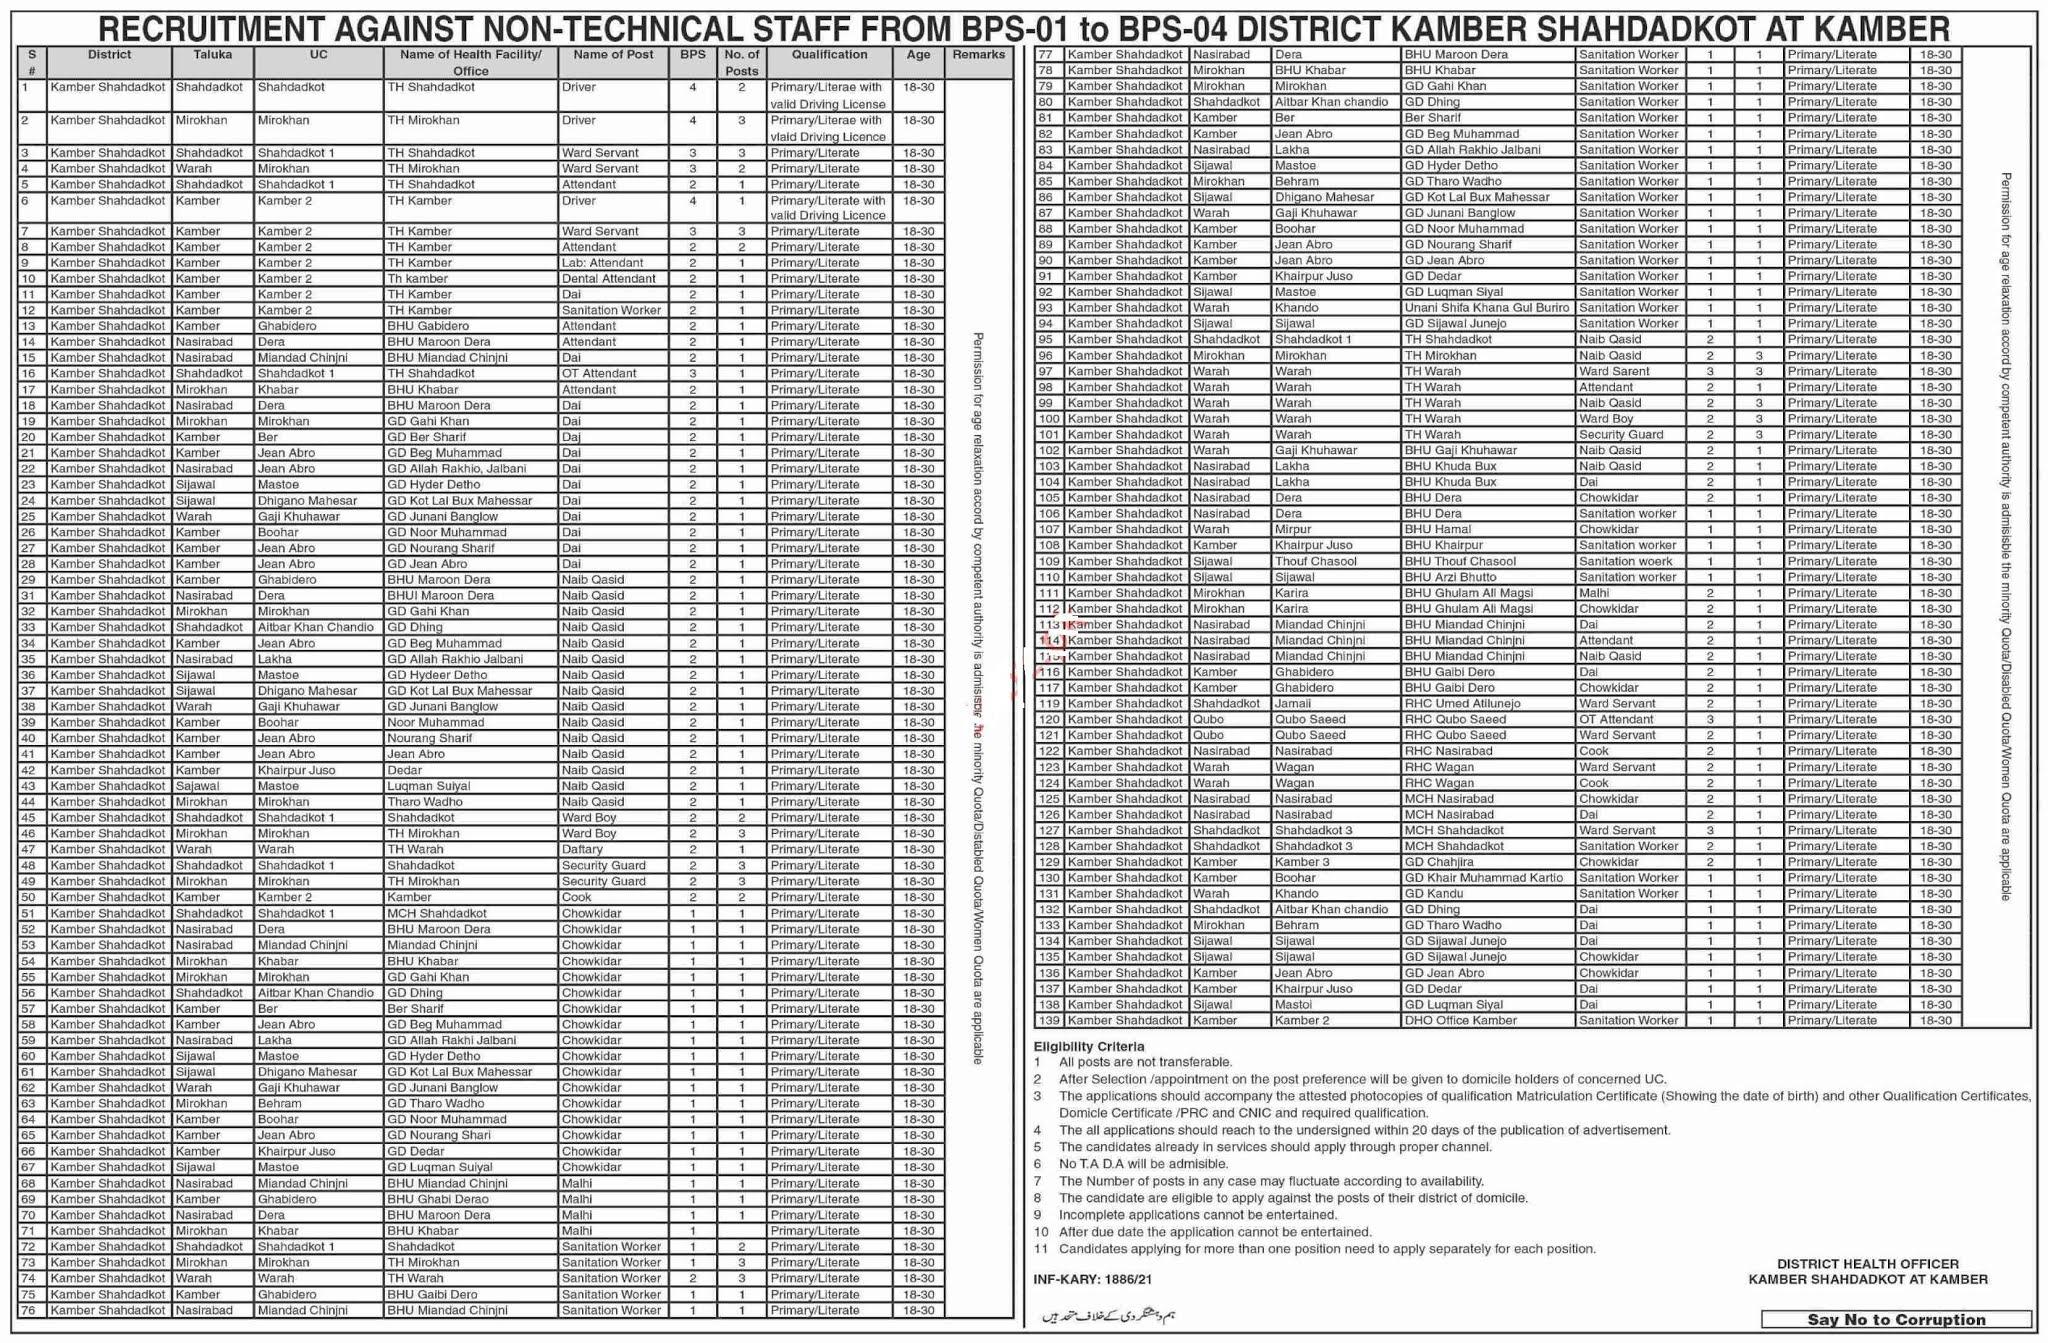 Health Department Medical Posts Shahdadpur 2021